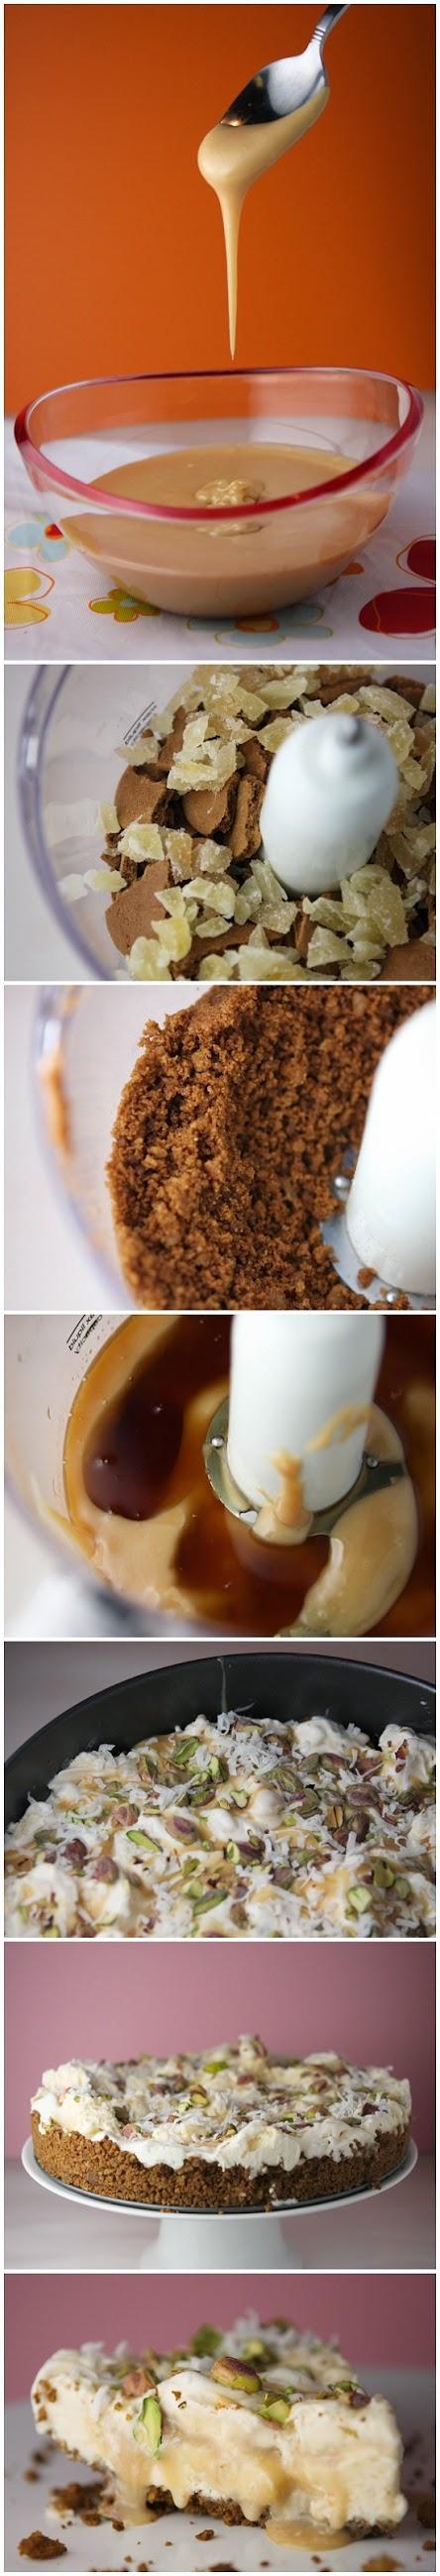 How To Make Passion fruit ice cream pie